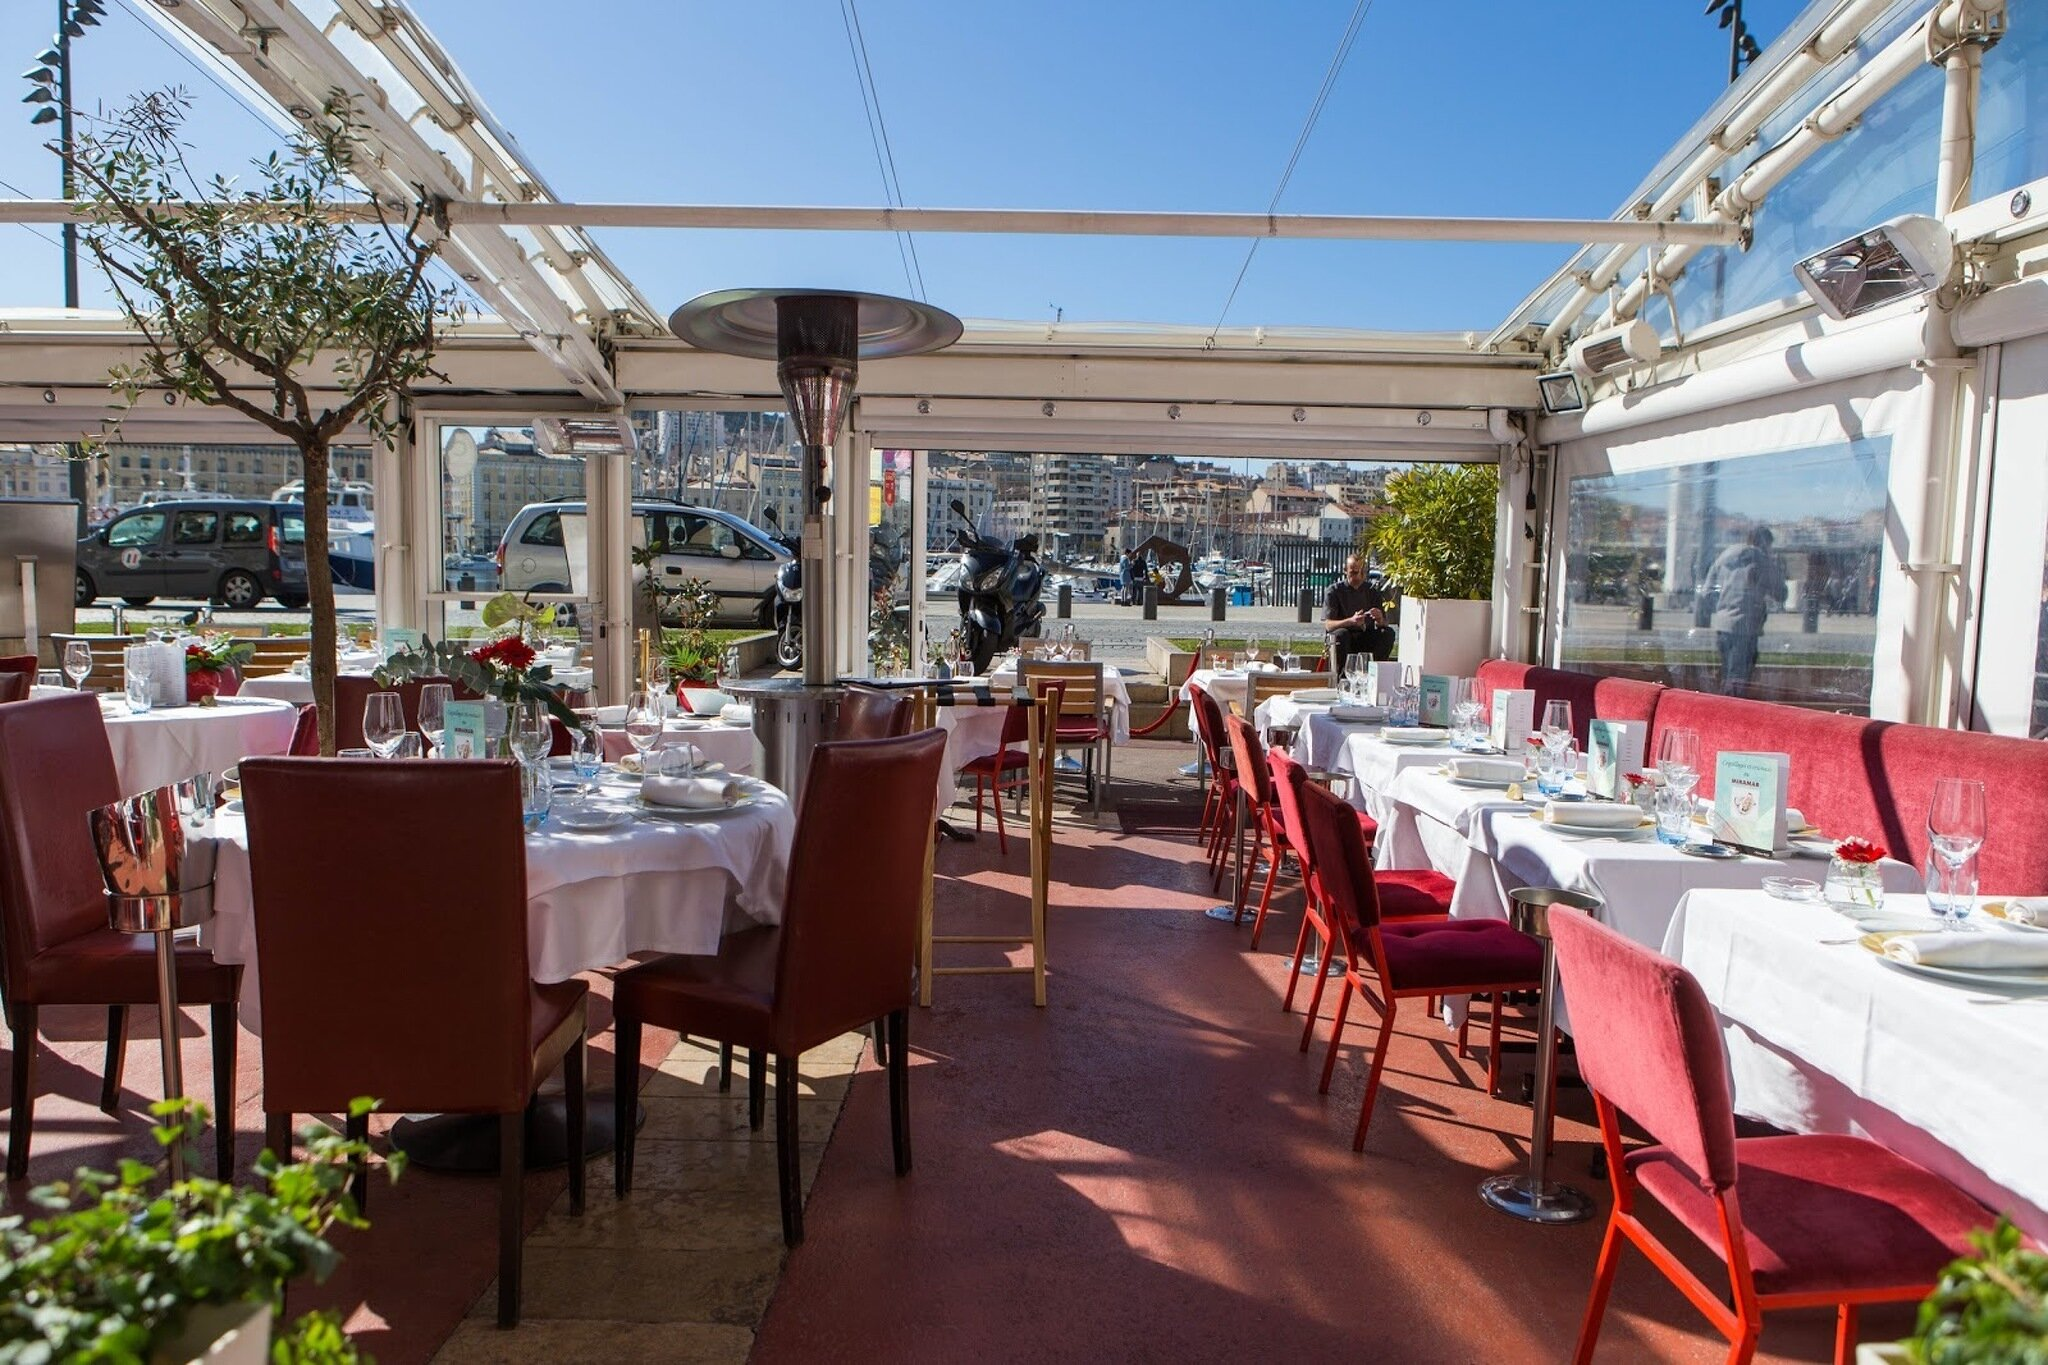 Le Miramar, a Bouillabaisse Charter Restaurant